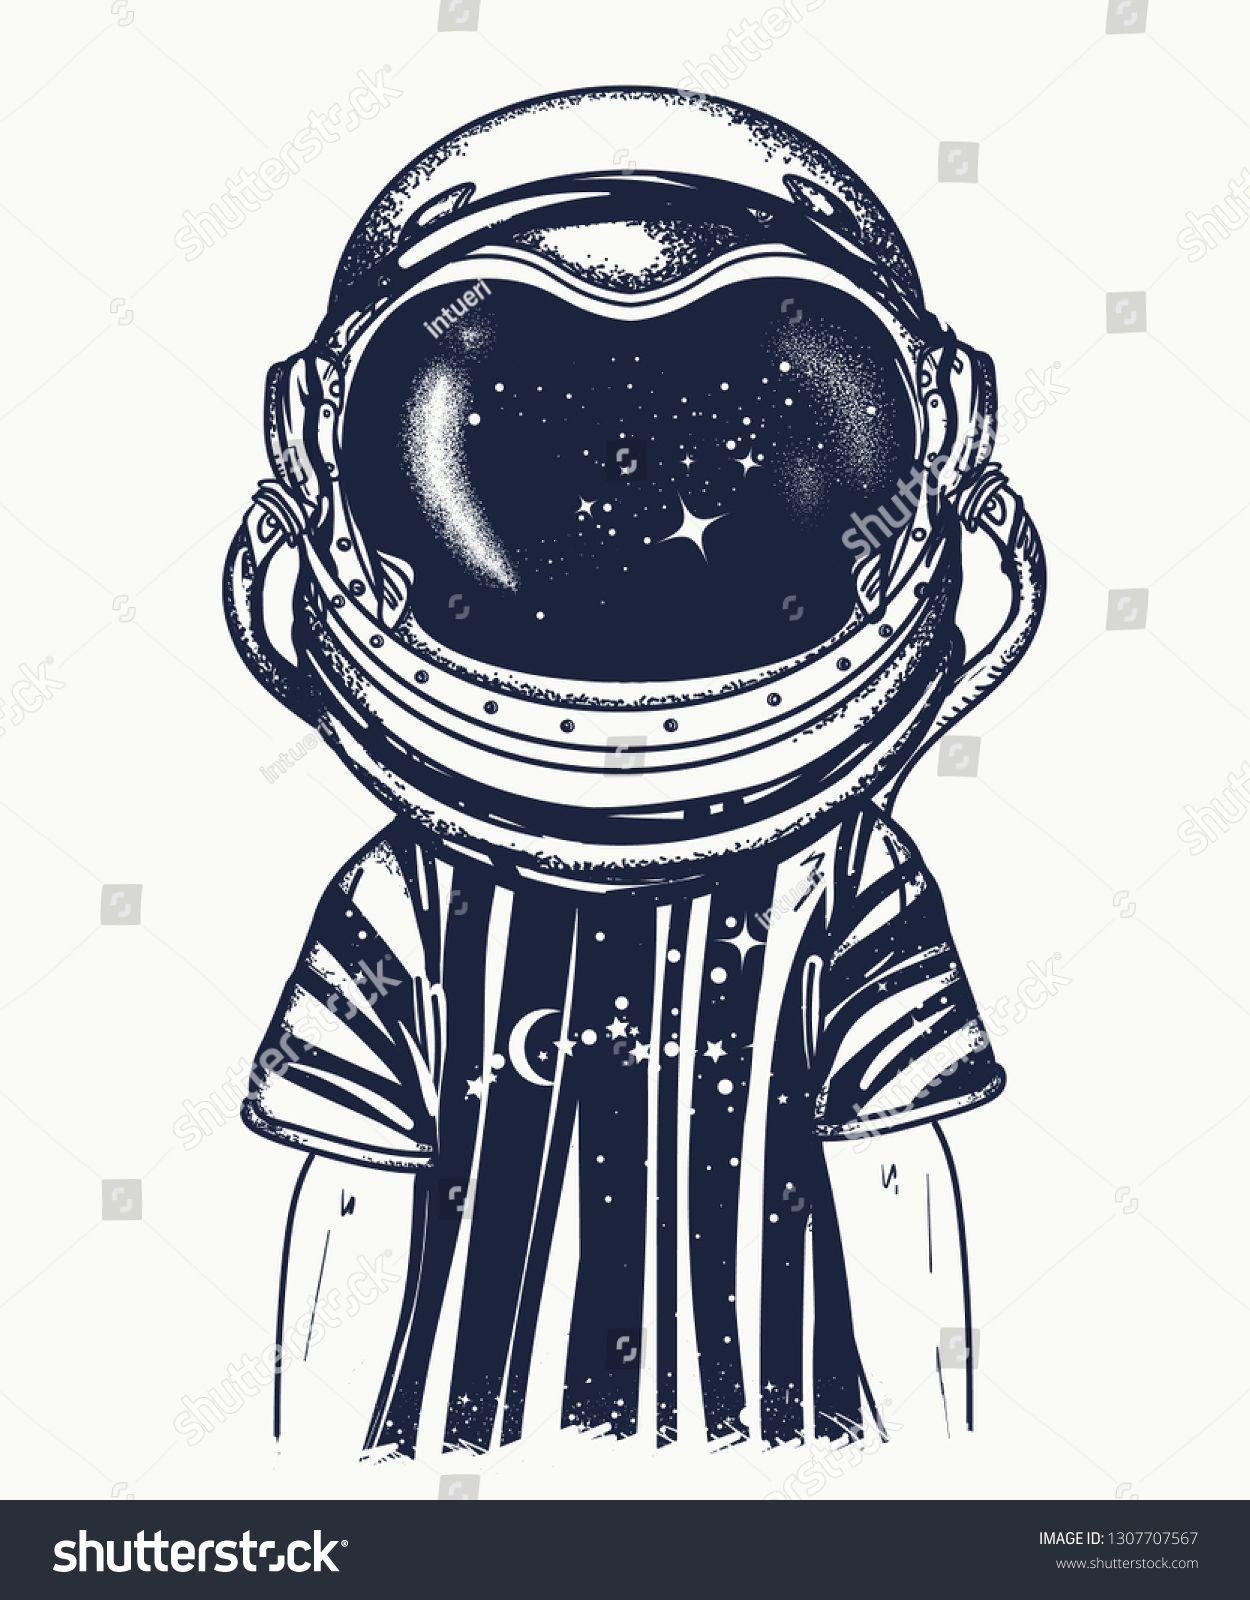 Astronaut Helmet Drawing : astronaut, helmet, drawing, Astronaut, Helmet., Tattoo, T-shirt, Design., Symbol, Imagination,, Education,, Inspiration., Childhood, Drea…, Helmet,, Helmet, Tattoo,, Drawing